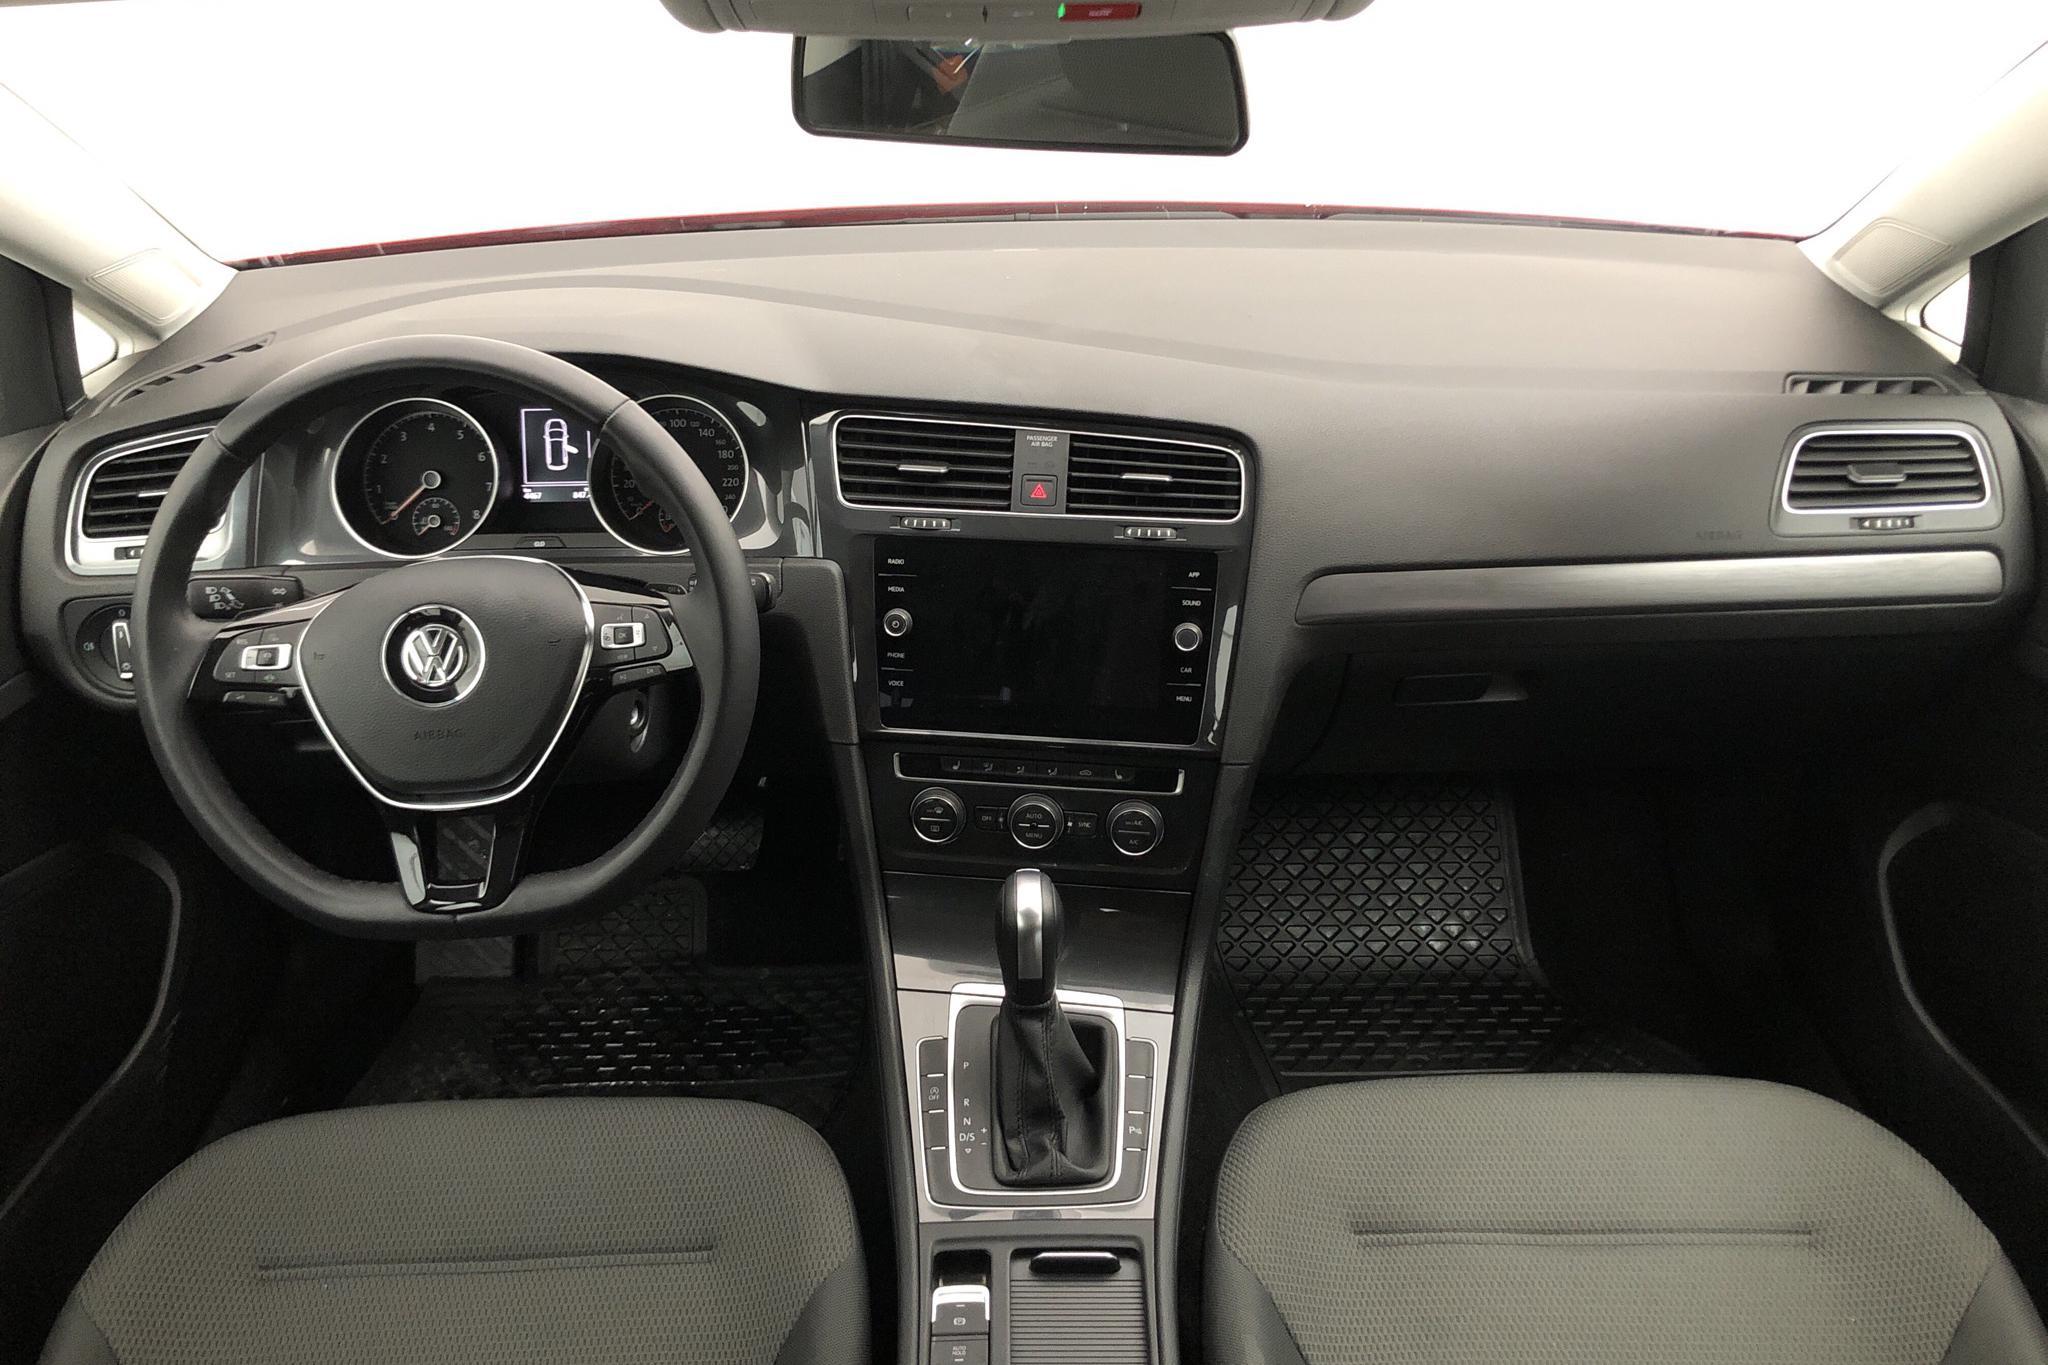 VW Golf VII 1.5 TSI Sportscombi (150hk) - 4 460 km - Automatic - red - 2020